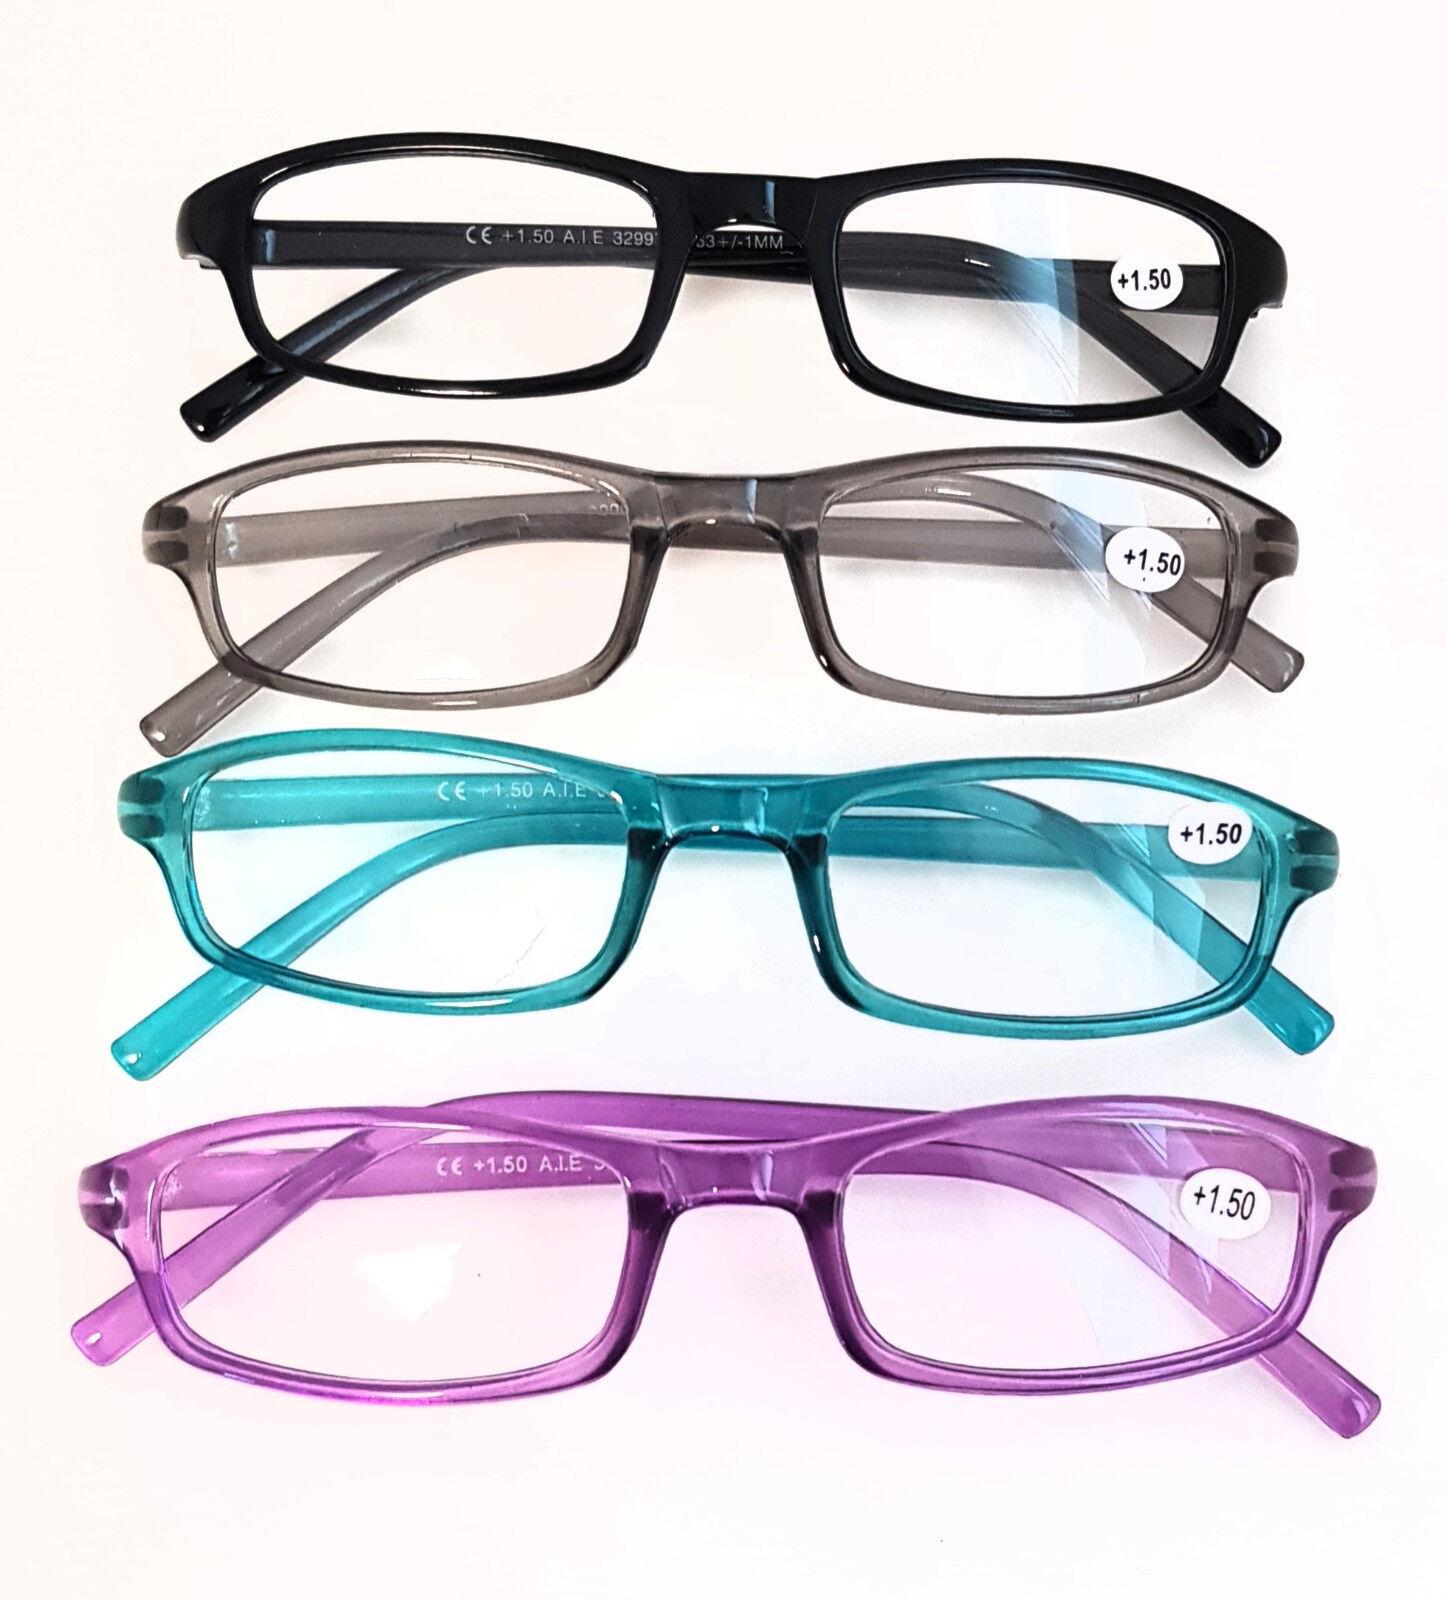 Stylische Lesebrillen Lesehilfe Lesebrille Sehstärke Brillen Augenoptik